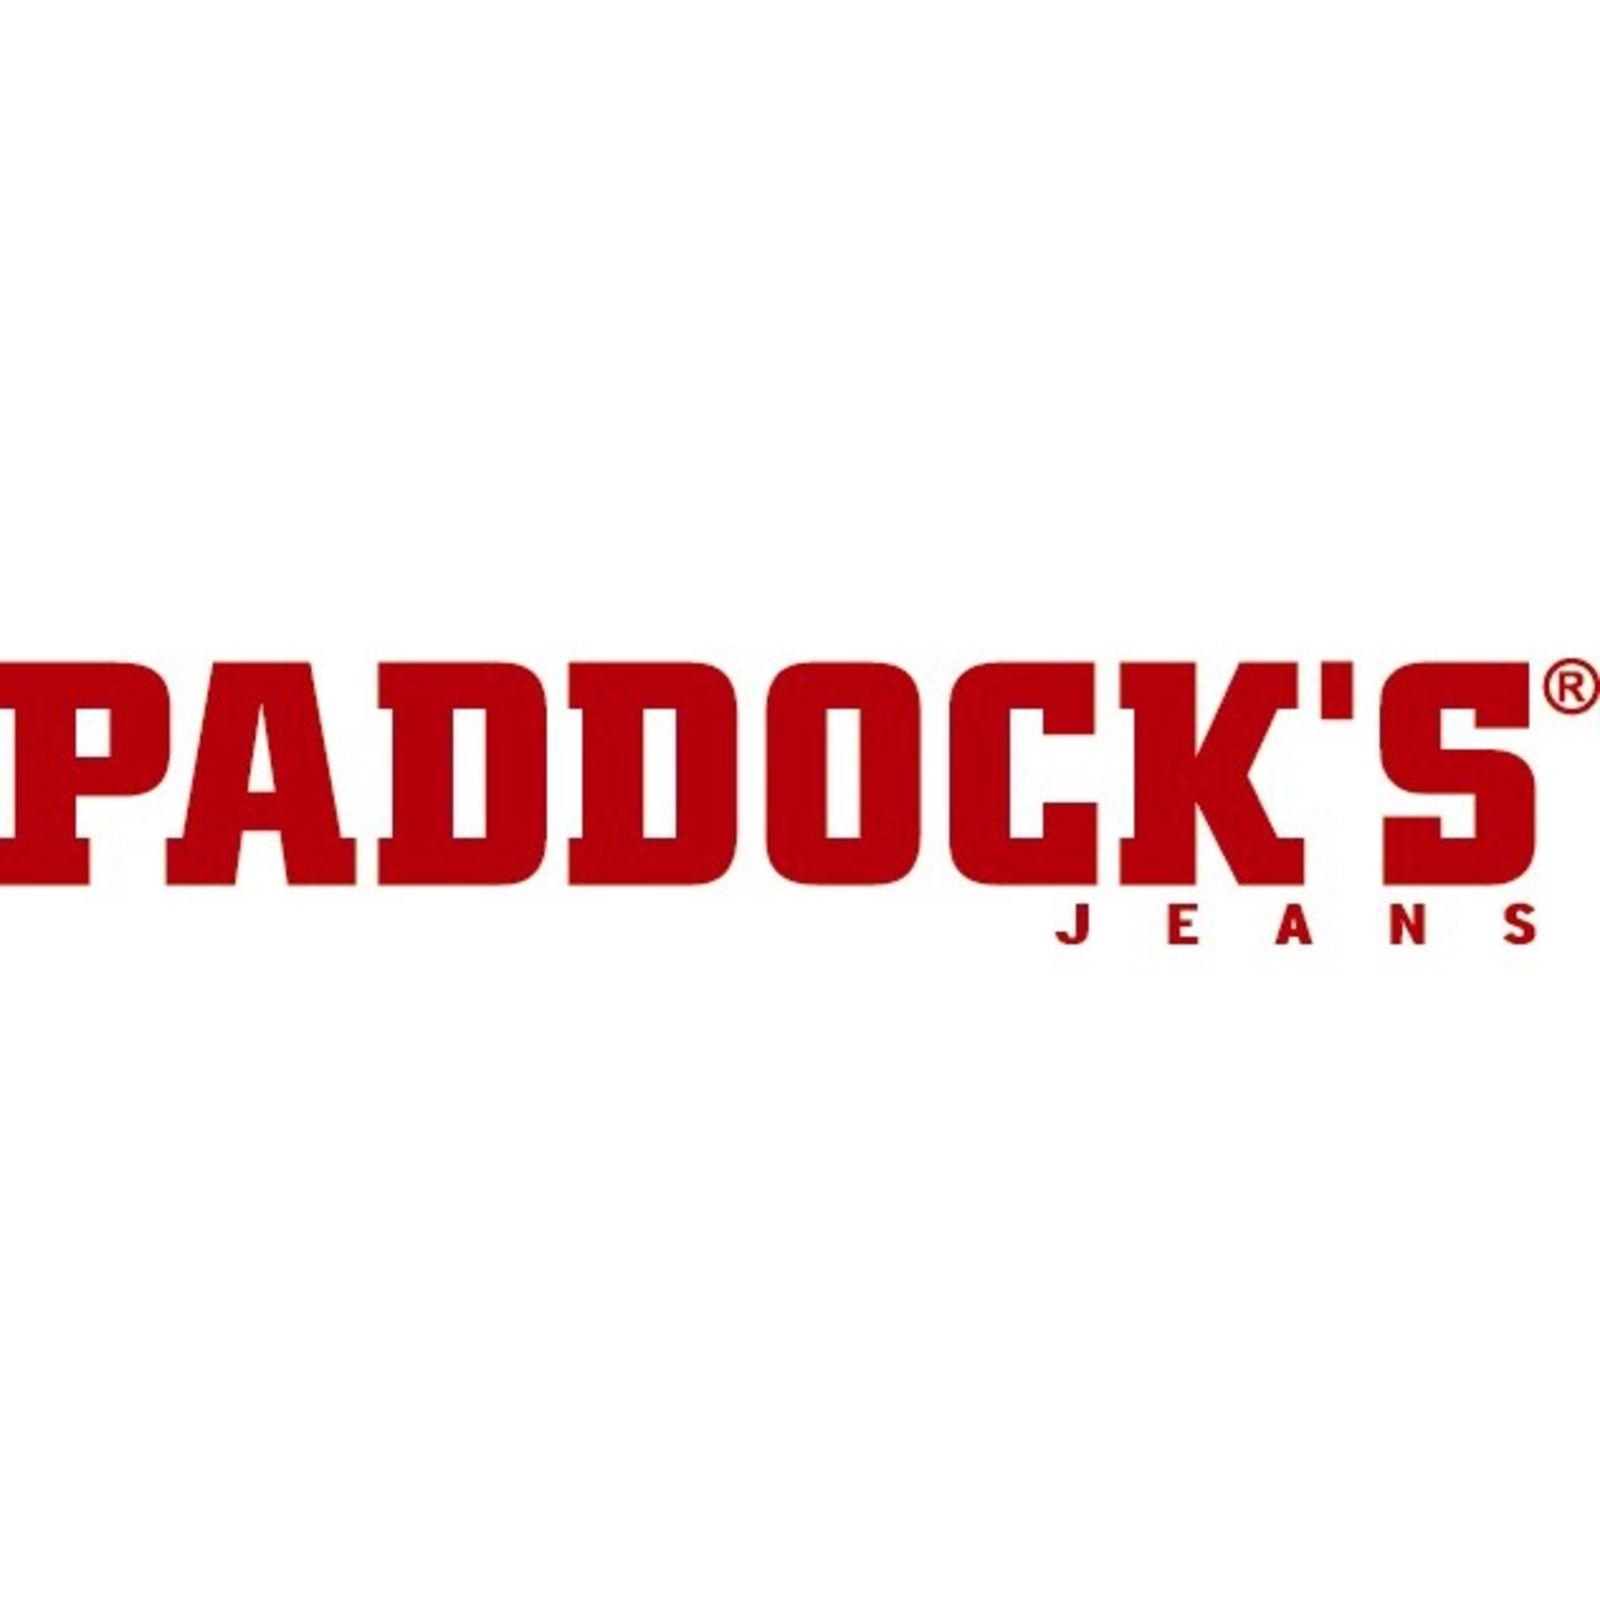 PADDOCK'S (Bild 1)